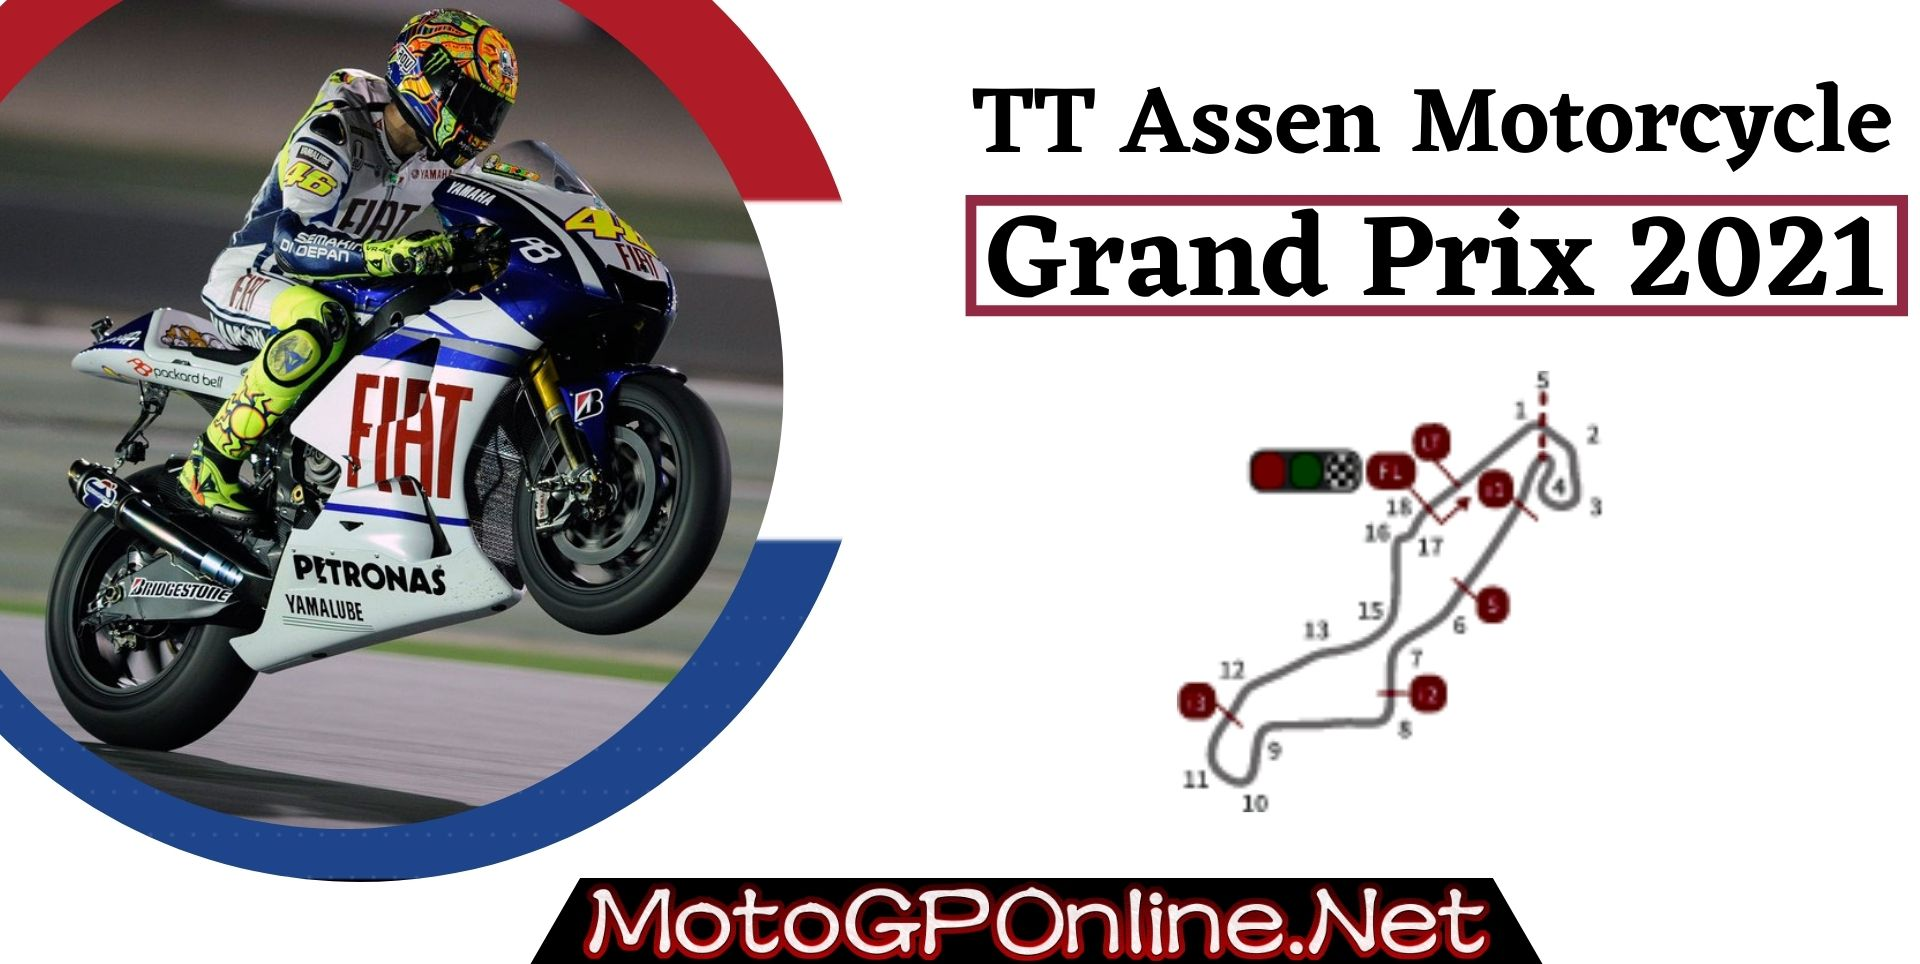 TT Assen Grand Prix Live Stream MotoGP 2021 | Full Race Replay